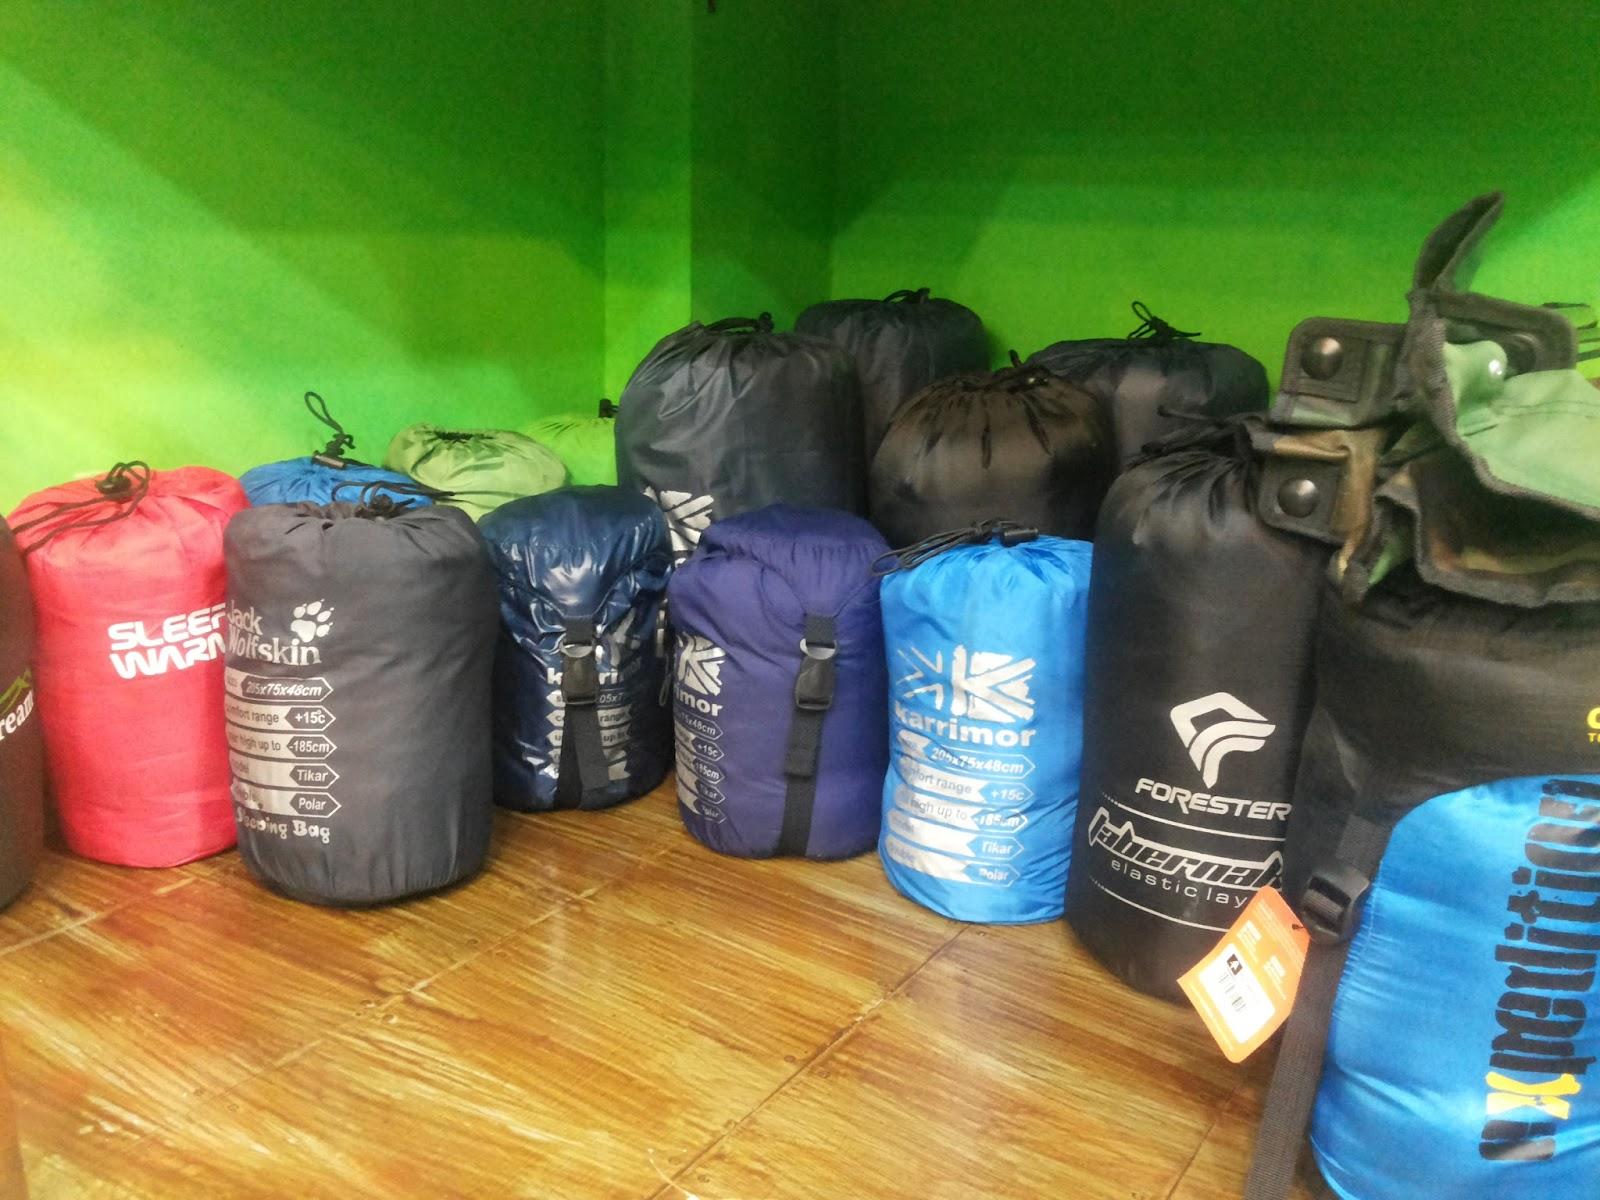 Stock Sb Sleeping Bags Consina Sweet Dream 1 Sleep Warmer Kecil 2 3 Expedition Besar 4 Jack Wolfskin 5 6 Forester